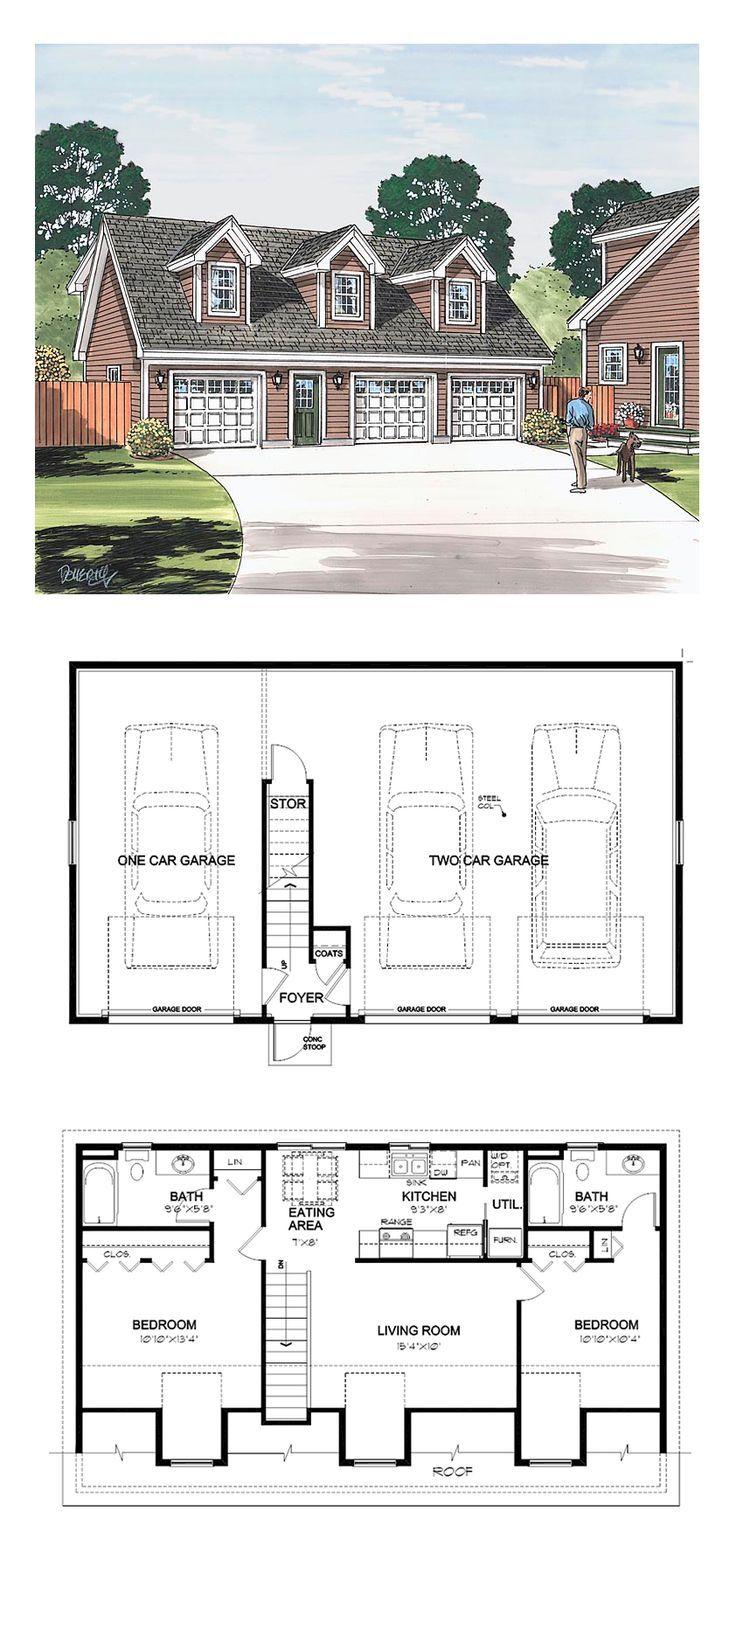 garage apartment plans. Download garage apartment plans for ...